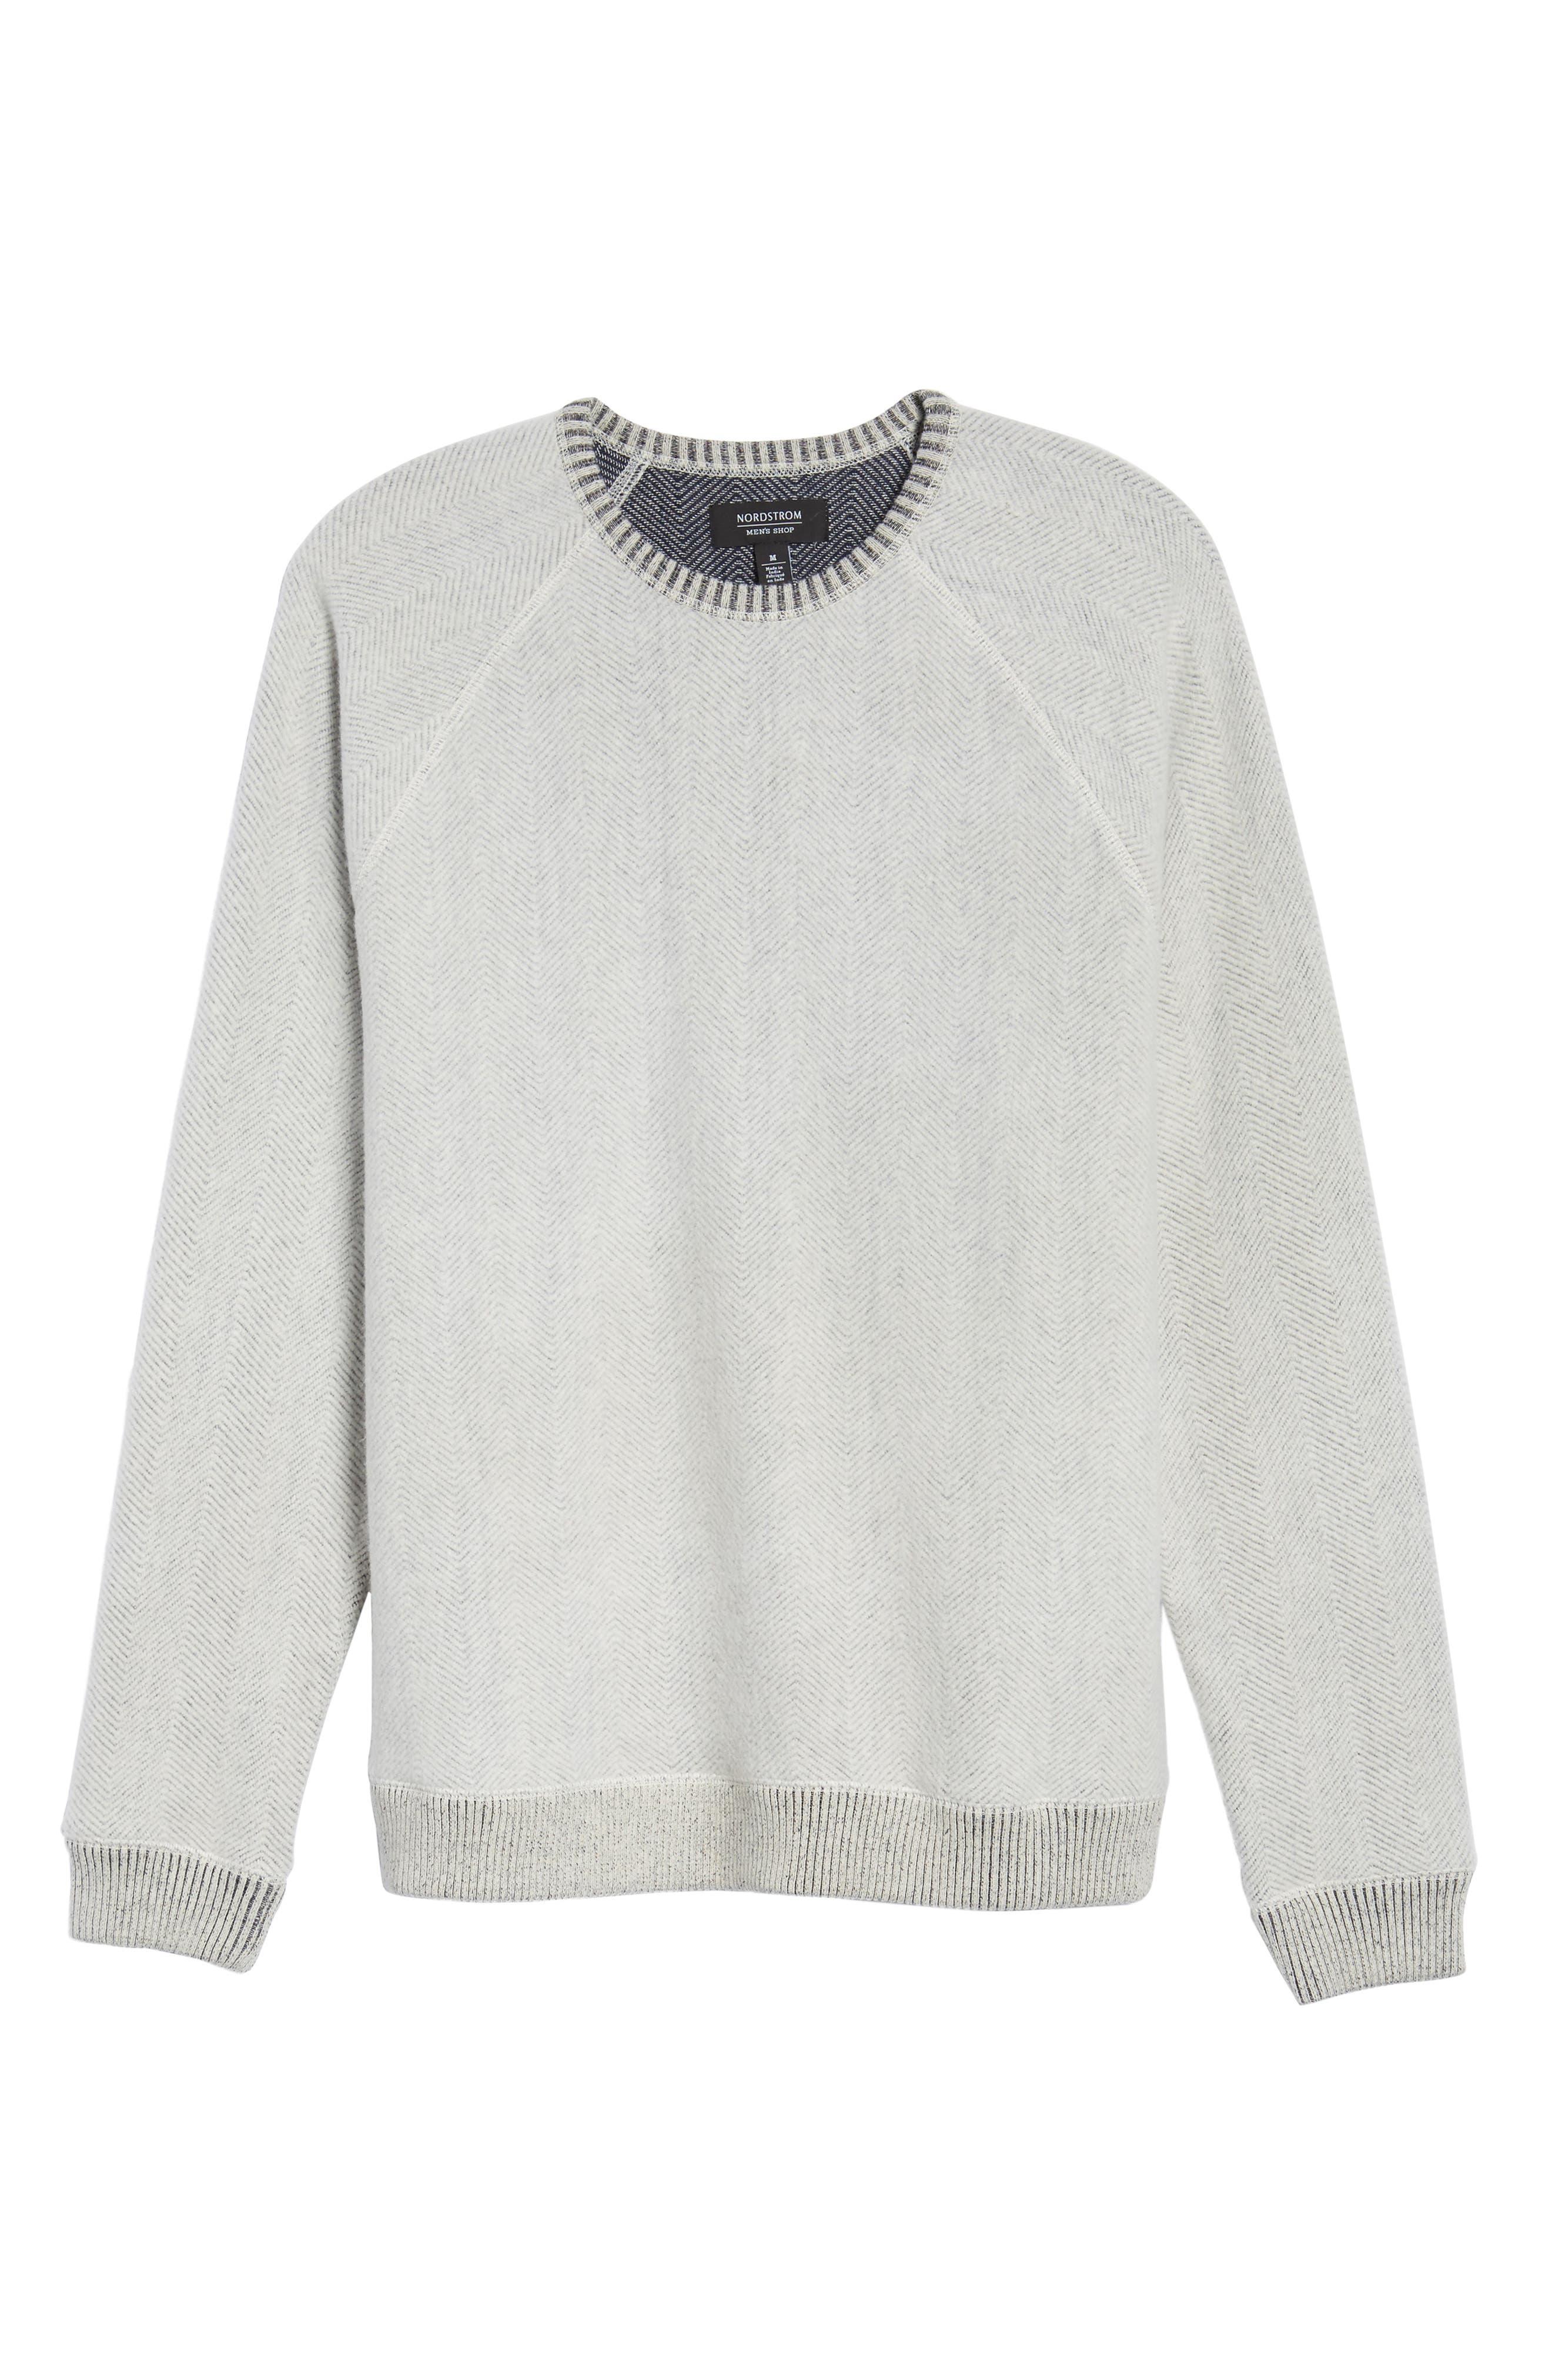 Brushed Fleece Sweatshirt,                             Alternate thumbnail 6, color,                             Ivory Egret